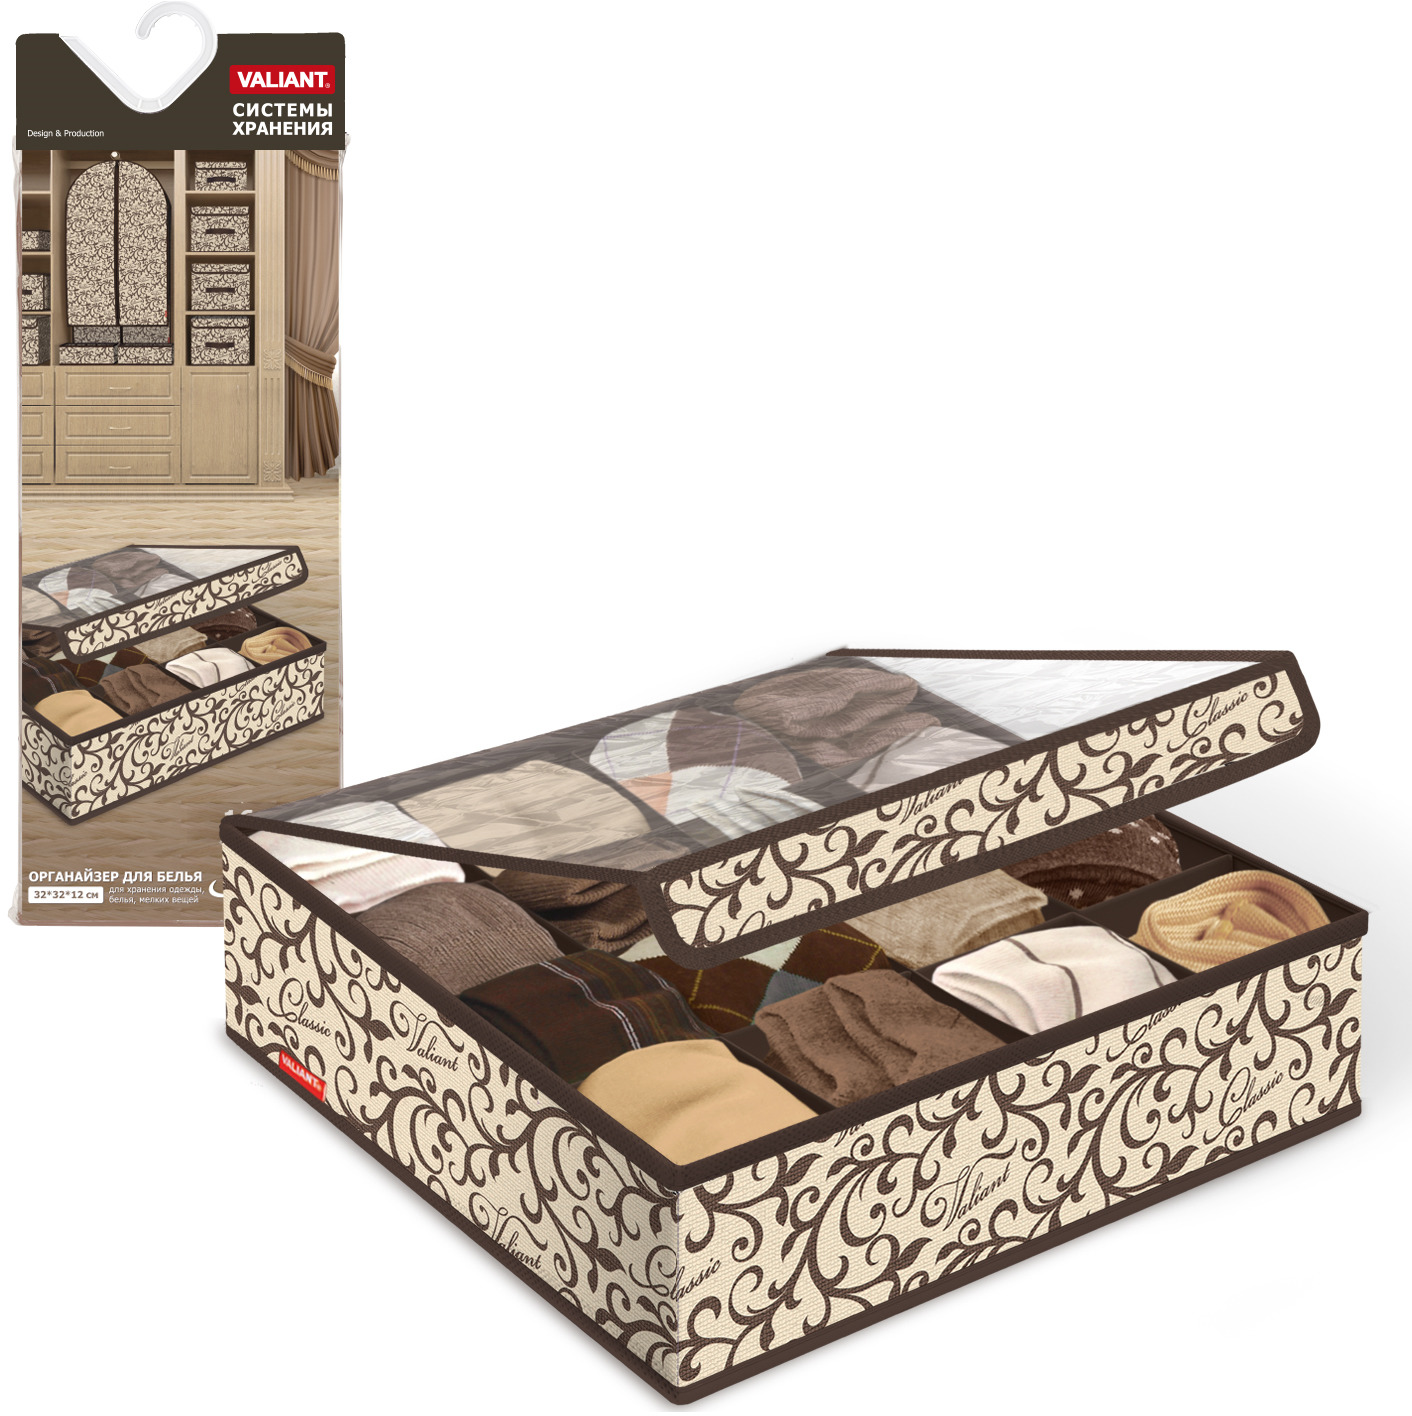 Органайзер для белья Valiant Classic, цвет: коричневый, 16 х 16 х 5 см органайзер для специй idea цвет белый 6 х 16 х 16 см